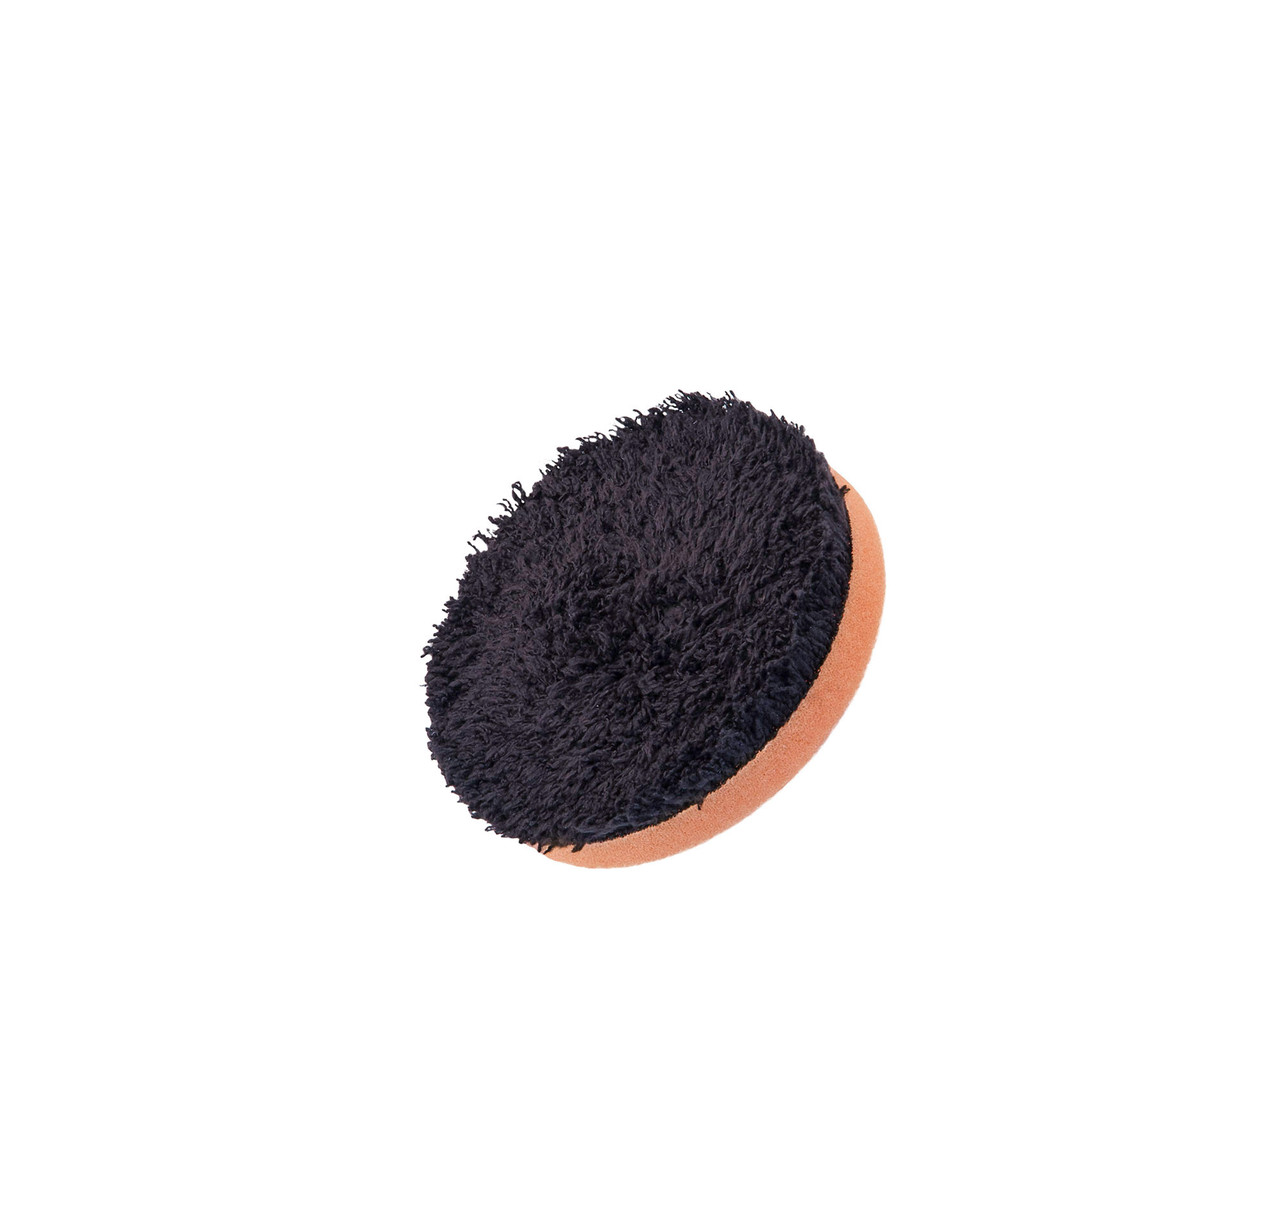 "Полірувальний круг микрофибровый - Flexipads Microfibre Cutting 80 мм (3"") чорно-помаранчевий (MGCB3)"